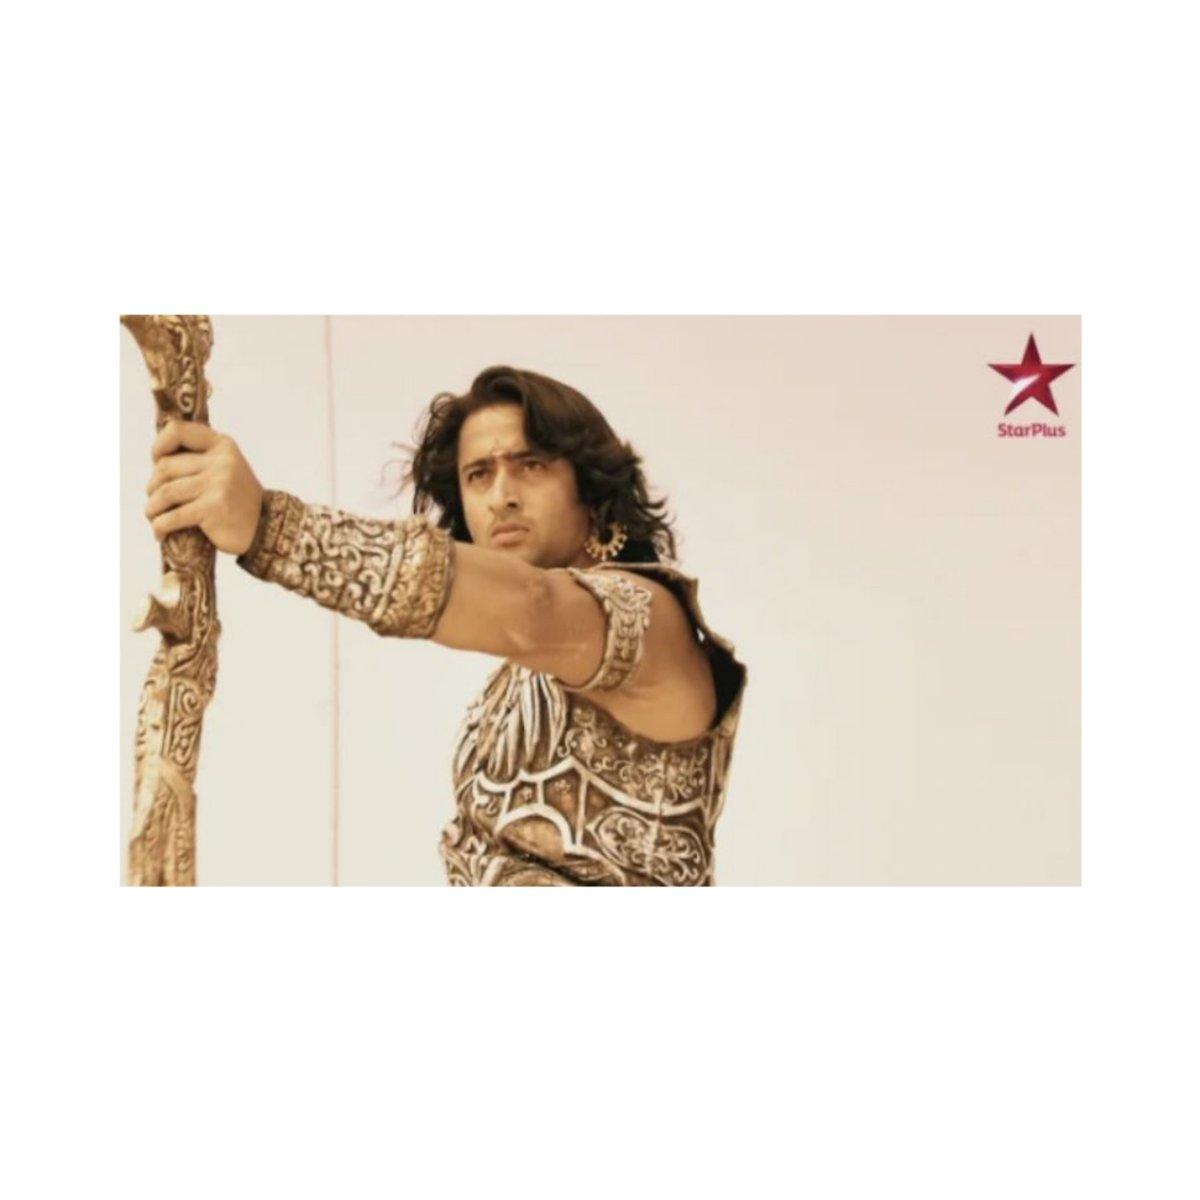 https://t.co/c3KCS9xzOZ  Another write-up on Arjuna of Mahabharat portrayed by Shaheer Sheikh @Shaheer_S on #7YearsOfMahabharatSP  #tales #writeups #bypuja #writer #writing #7yearsofmahabharat #mahabharat #arjun #arjuna #shaheersheikh #shaheerbirdies #starplus #swastikproductions https://t.co/vFQ0FsfVHp